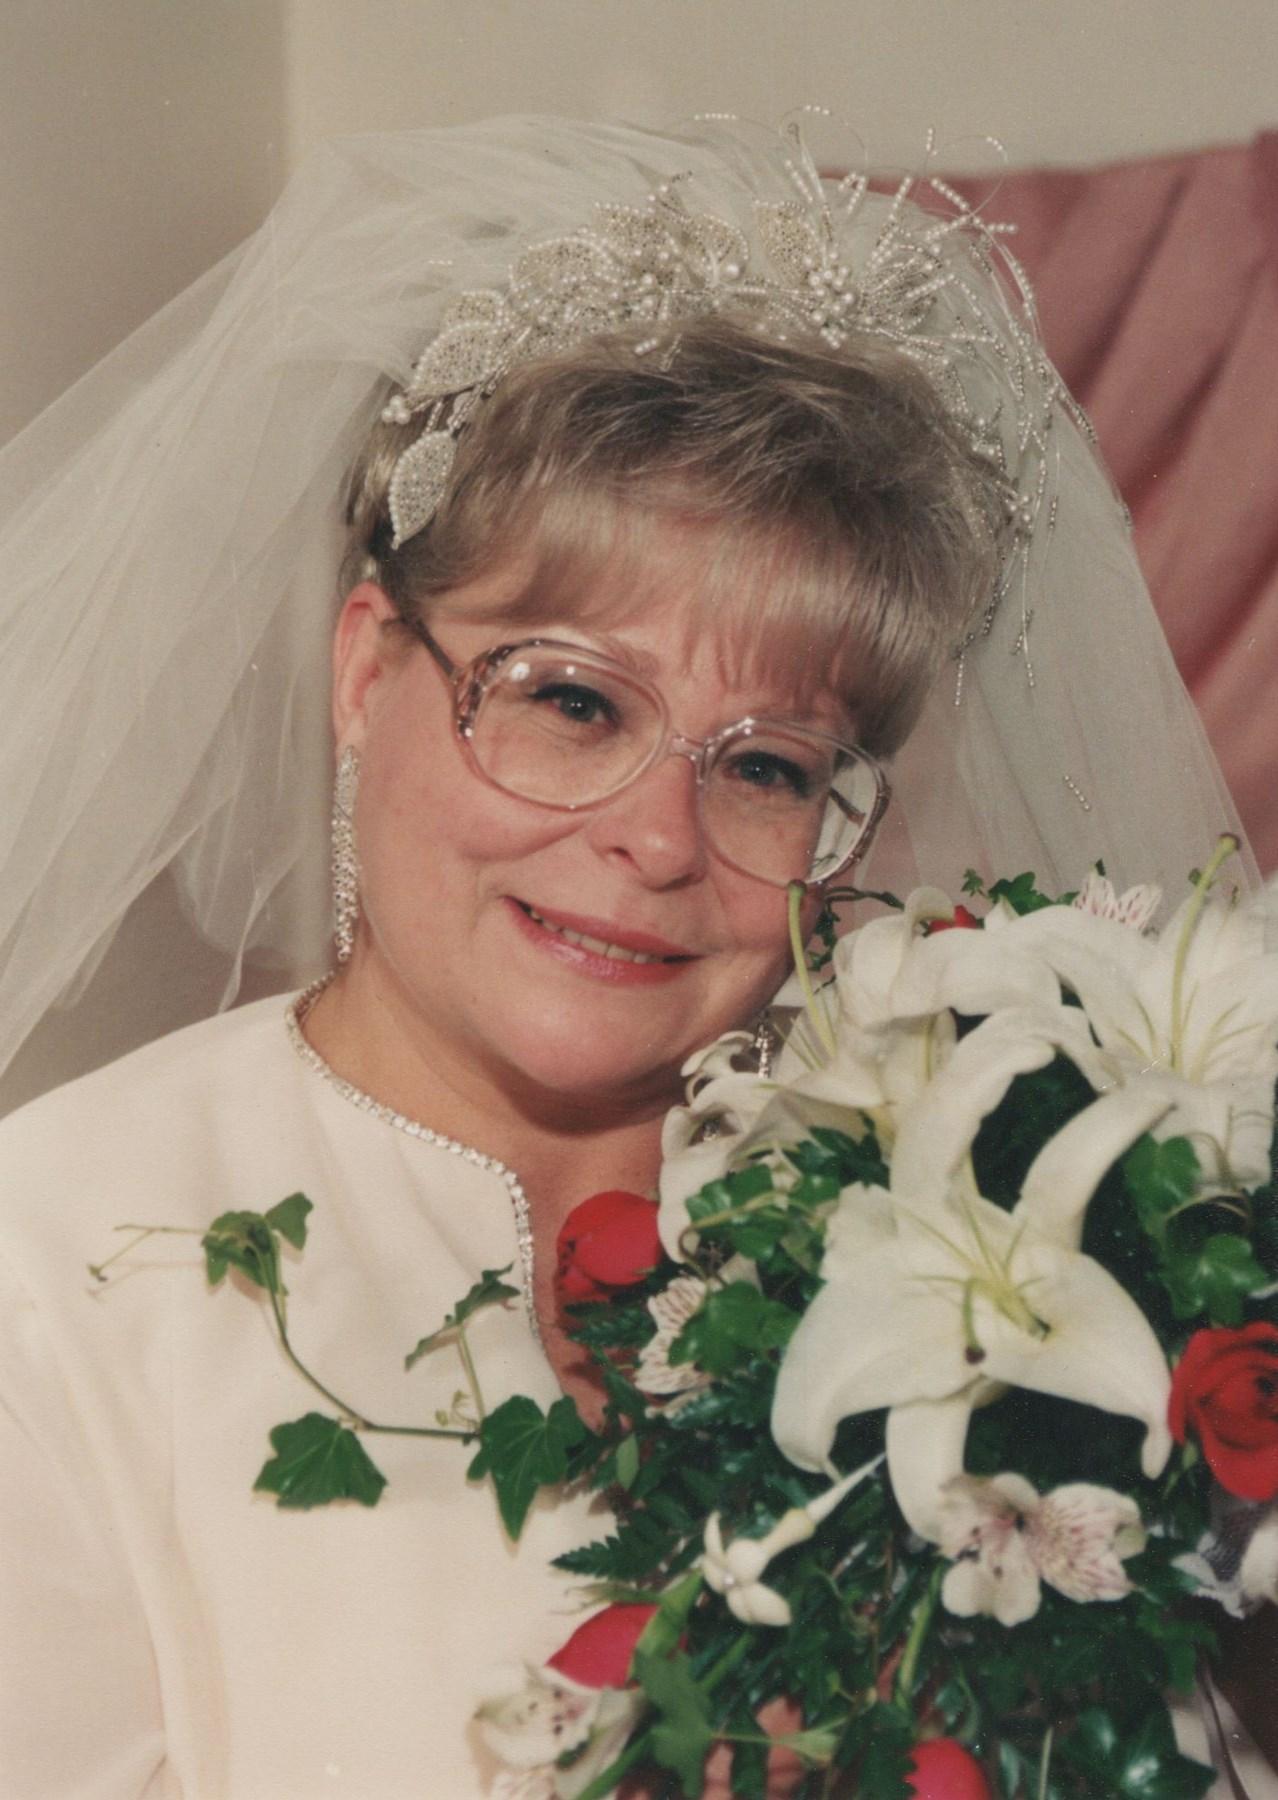 picture Judi Evans born July 12, 1964 (age 54)